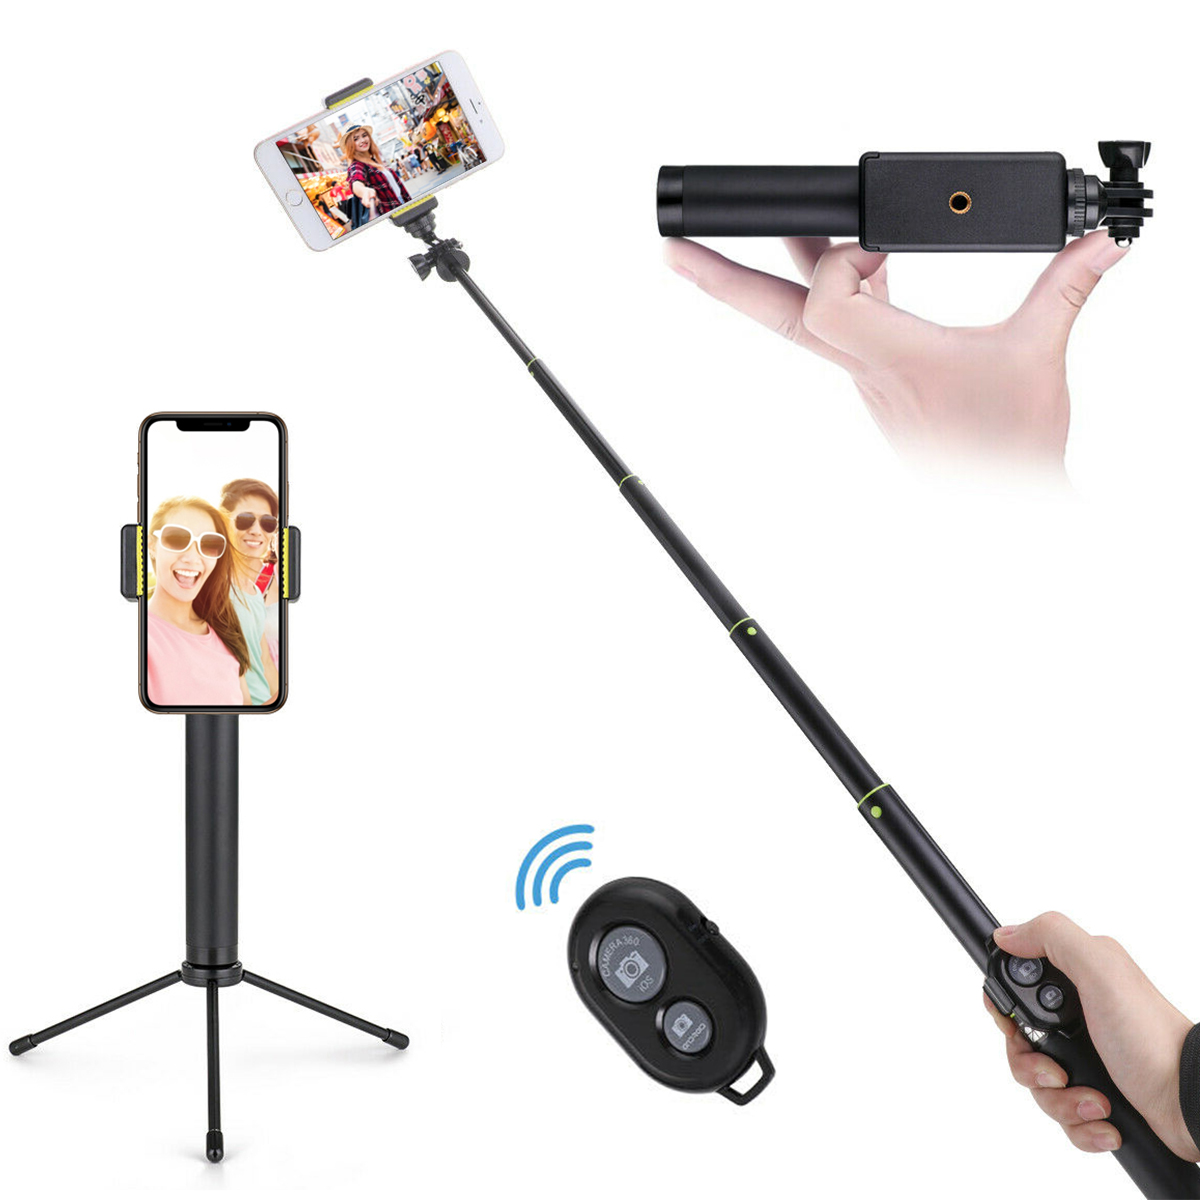 Portátil 3 em 1 selfie vara tripé